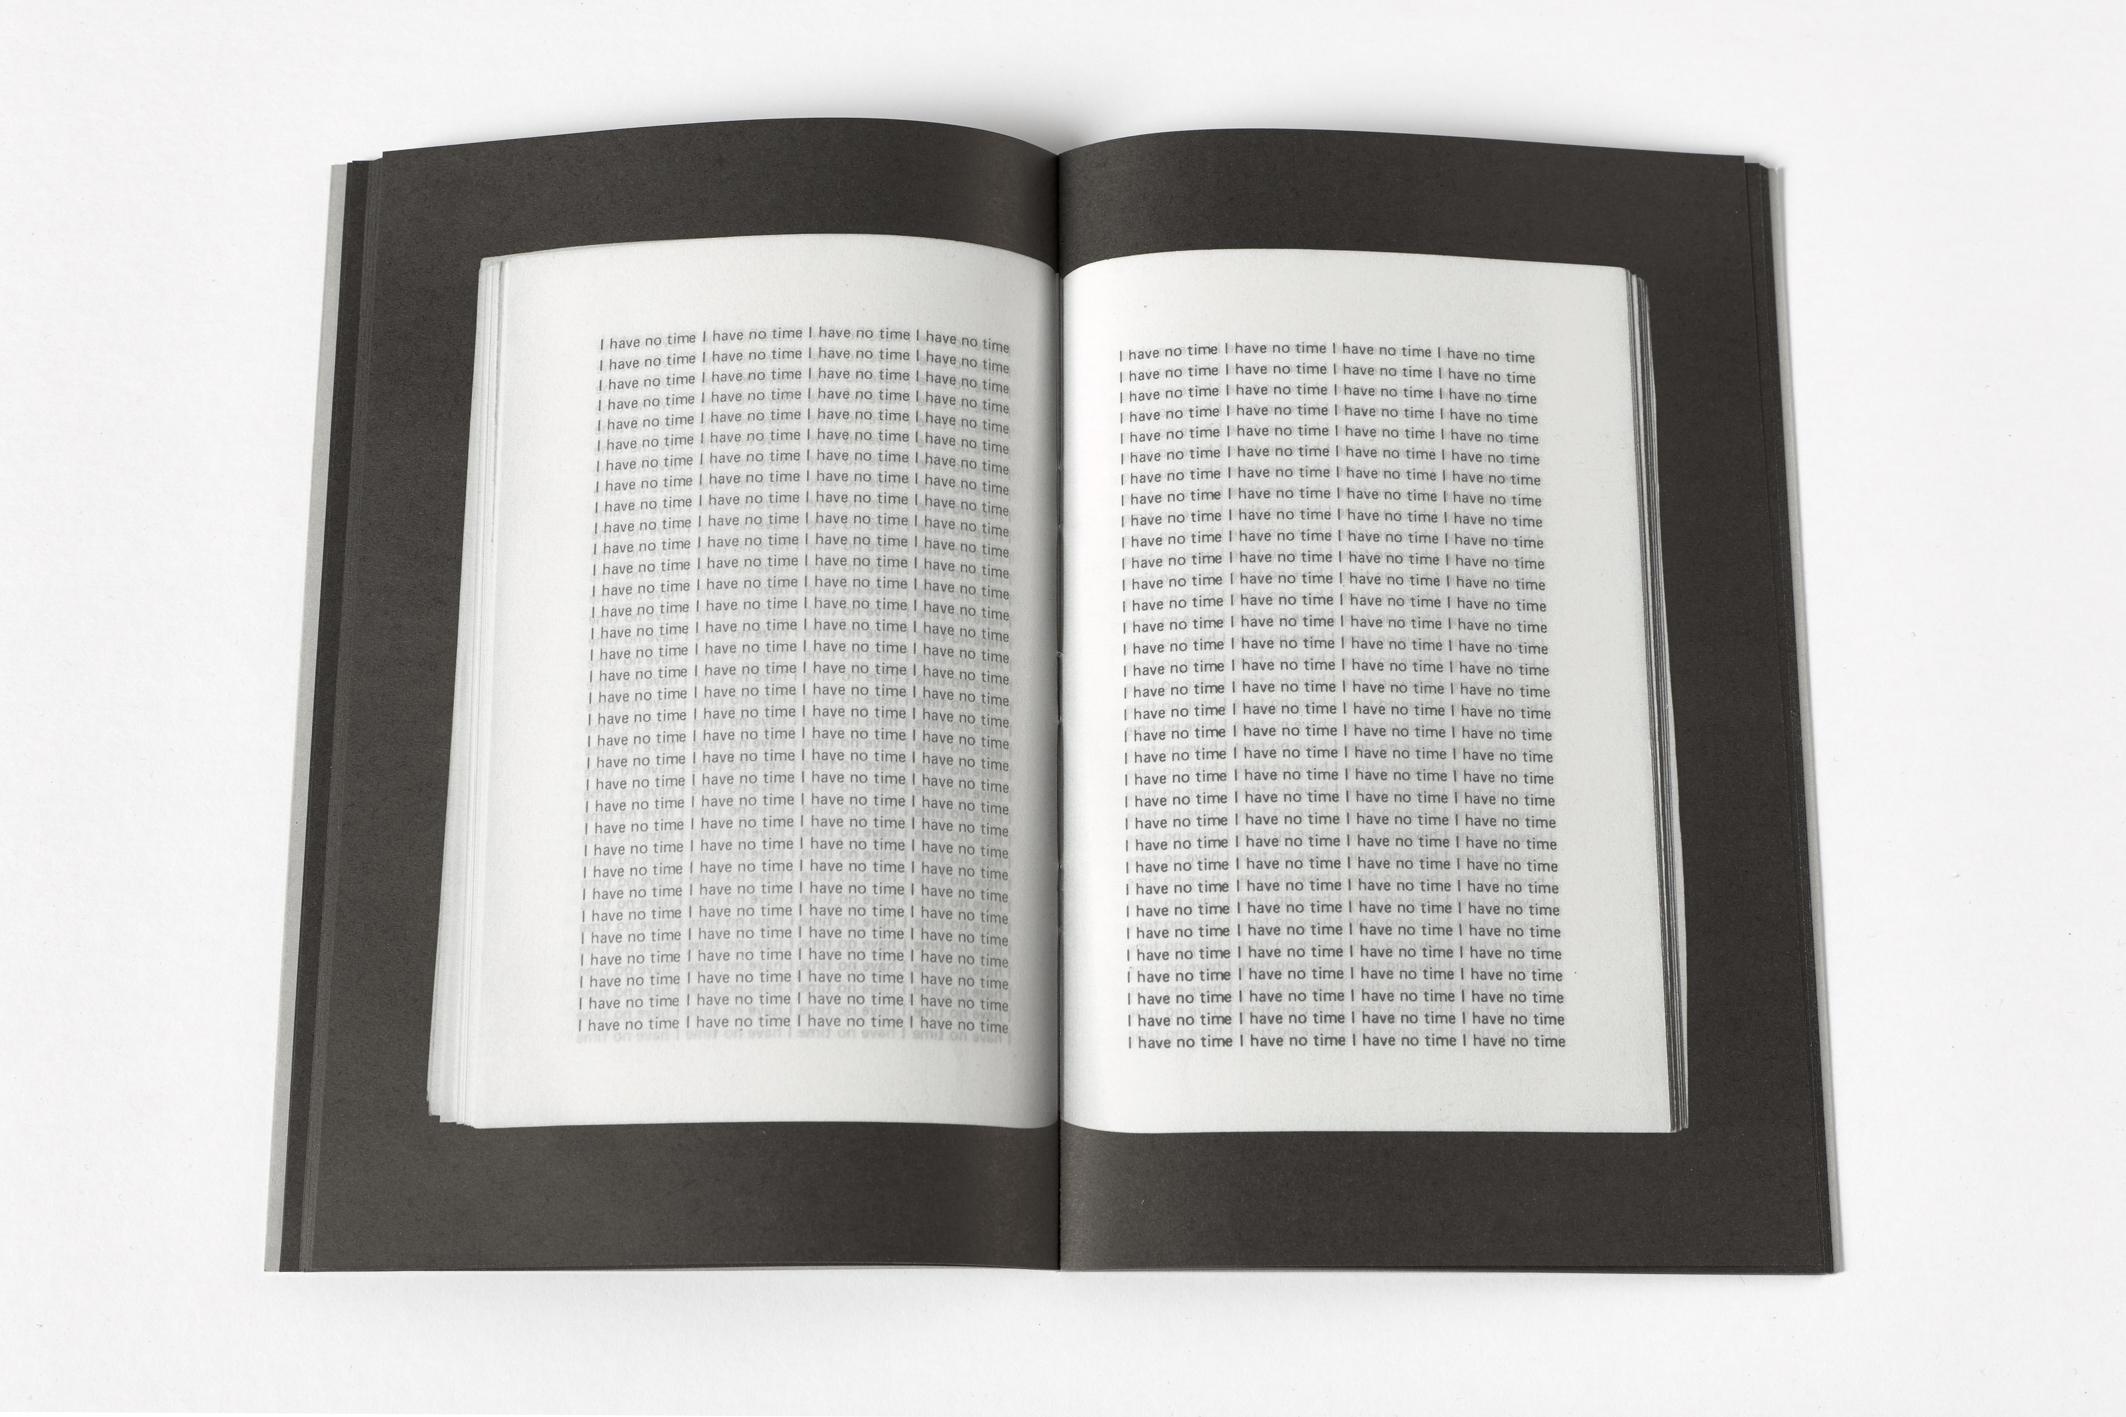 3Ply - Reprint No. 3-037.jpg